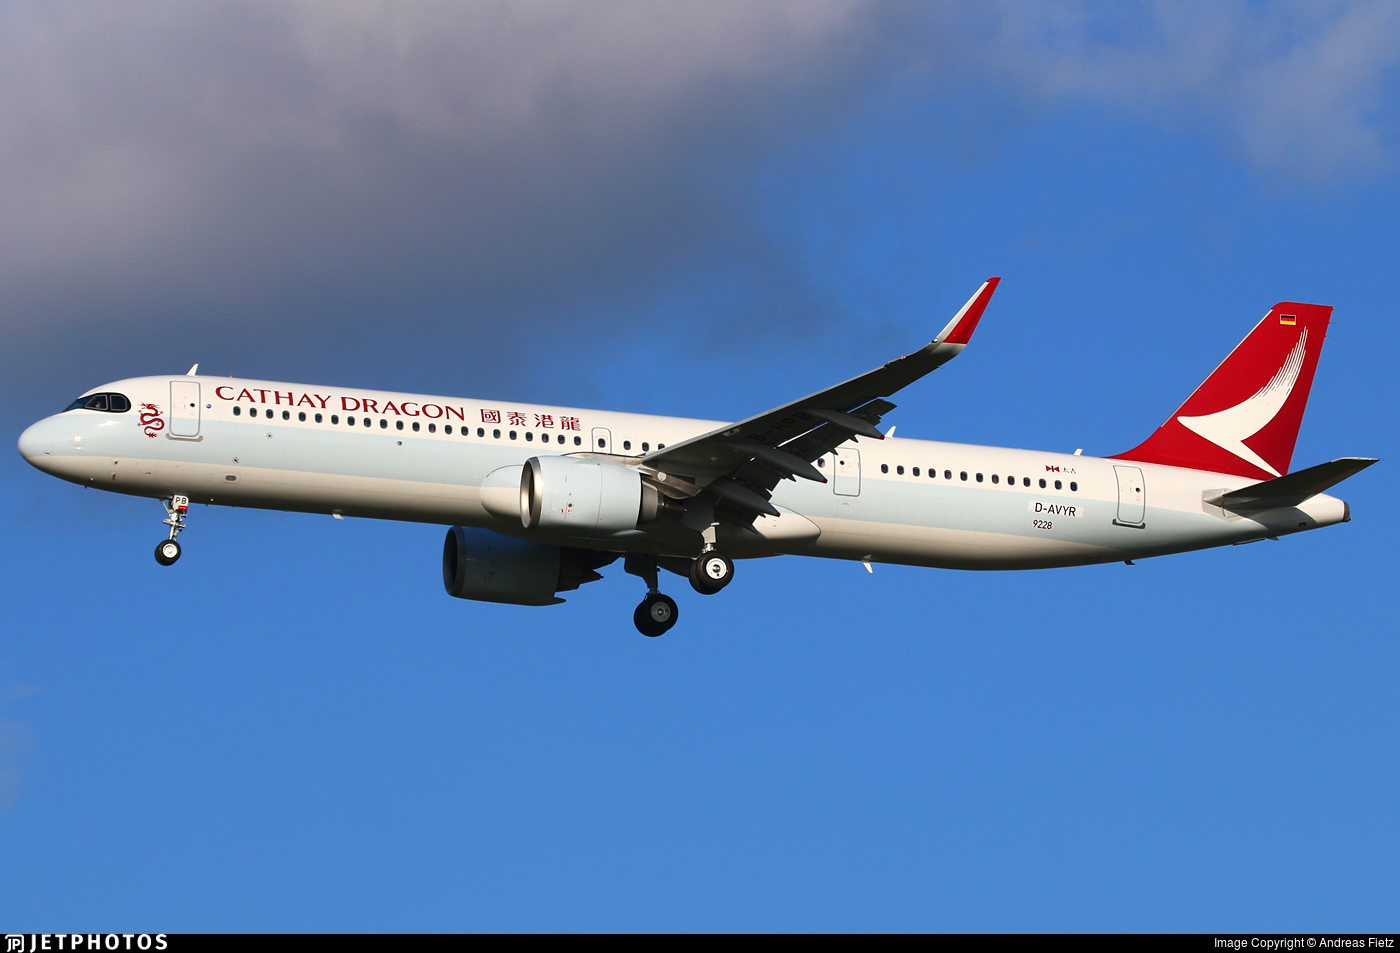 D-AVYR - Airbus A321-251NX - Cathay Dragon